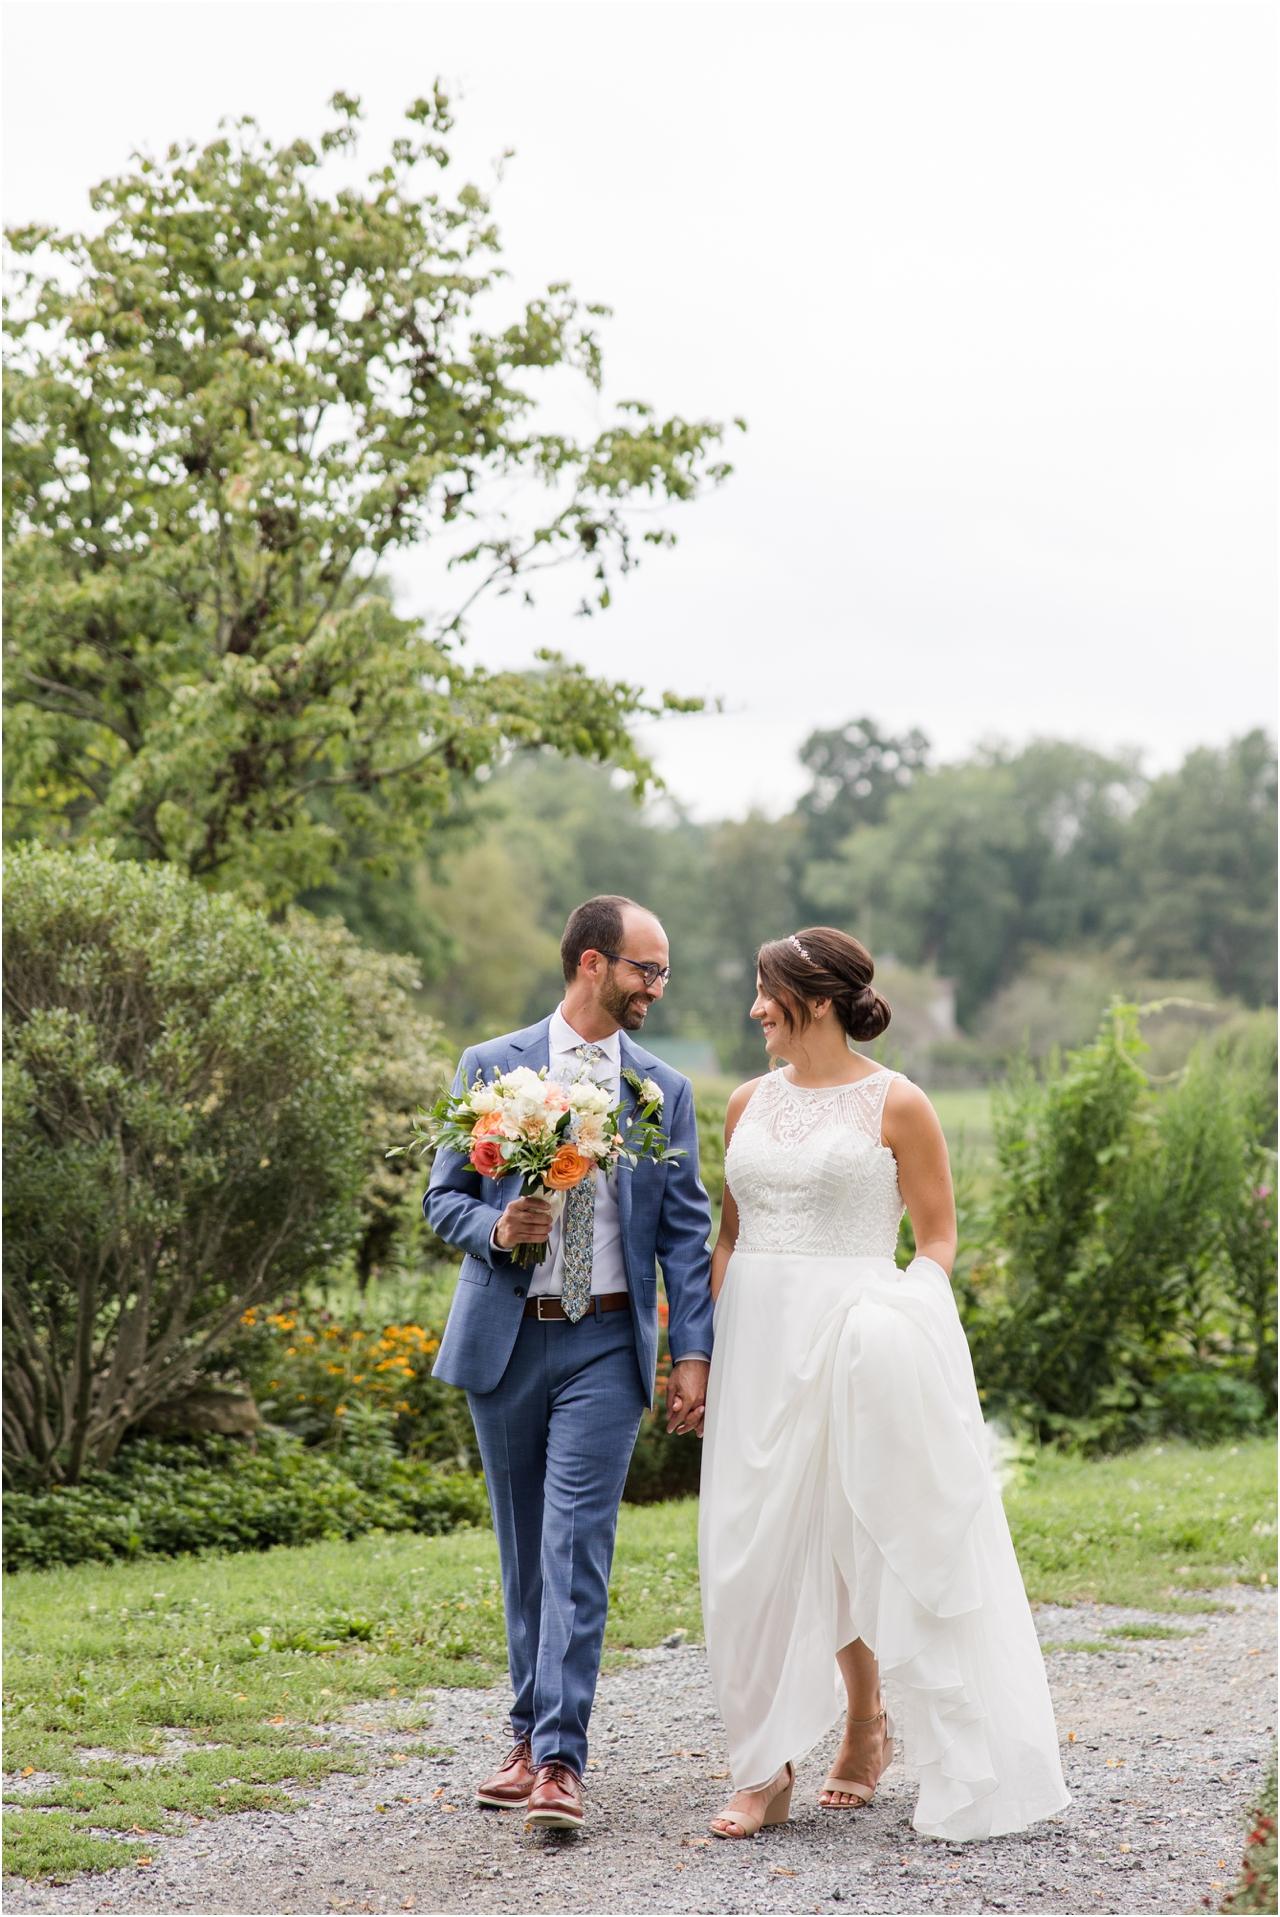 Sylvanside_Farm_Wedding_016